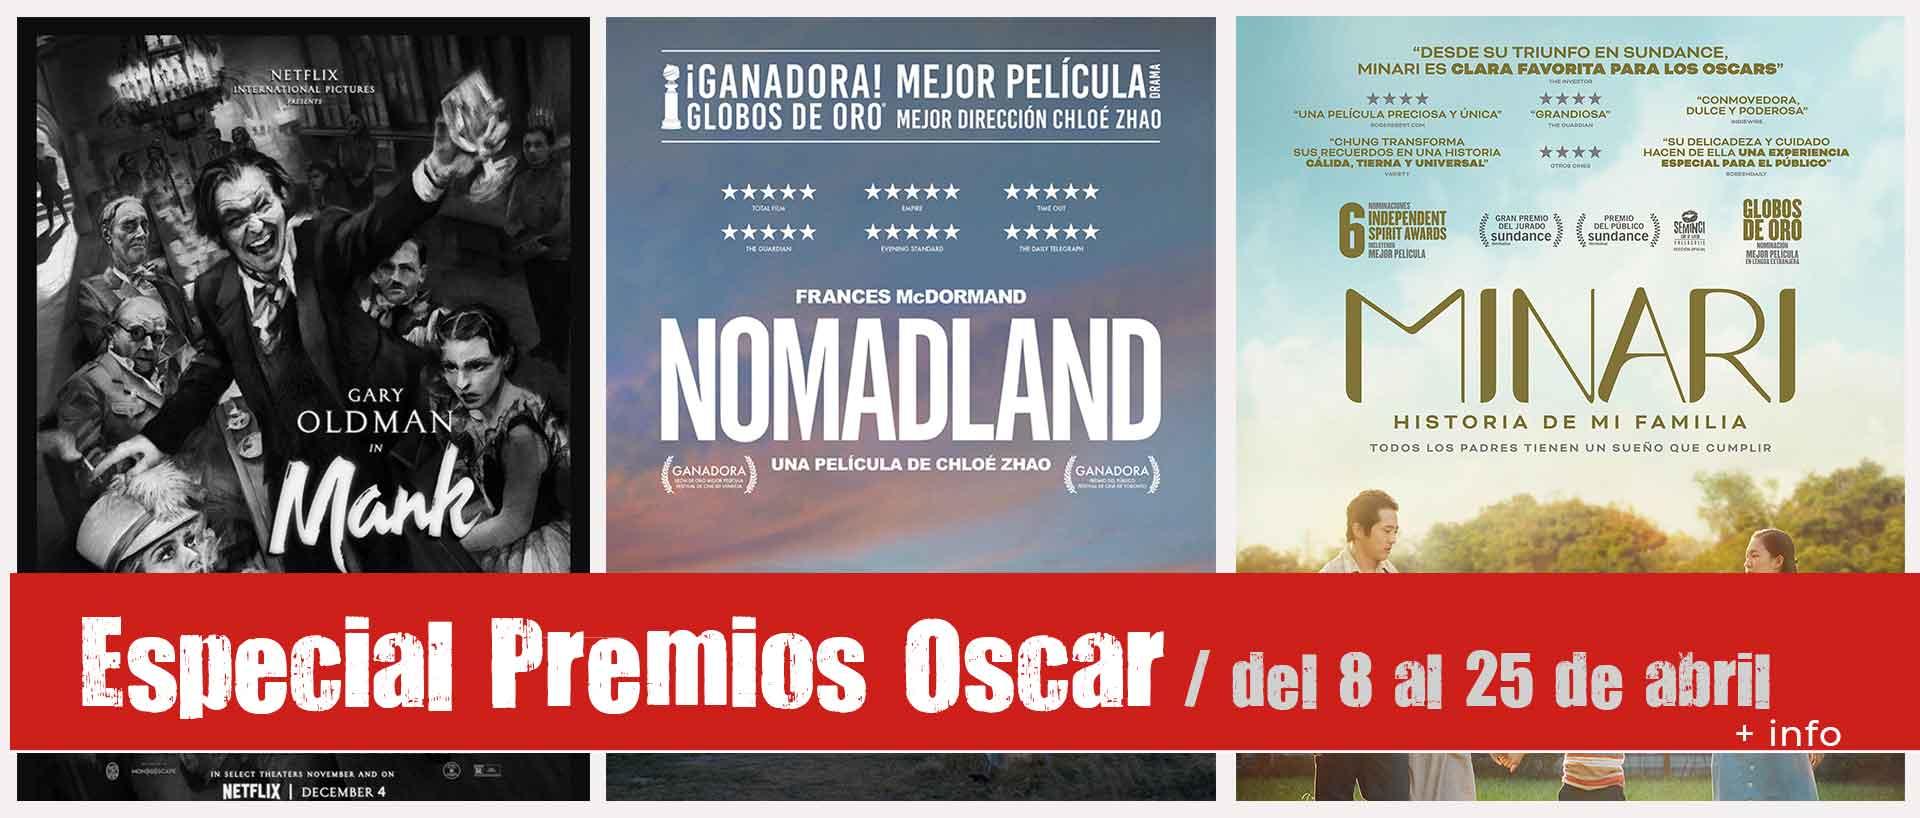 Oscars-Portada-Noticia.jpg